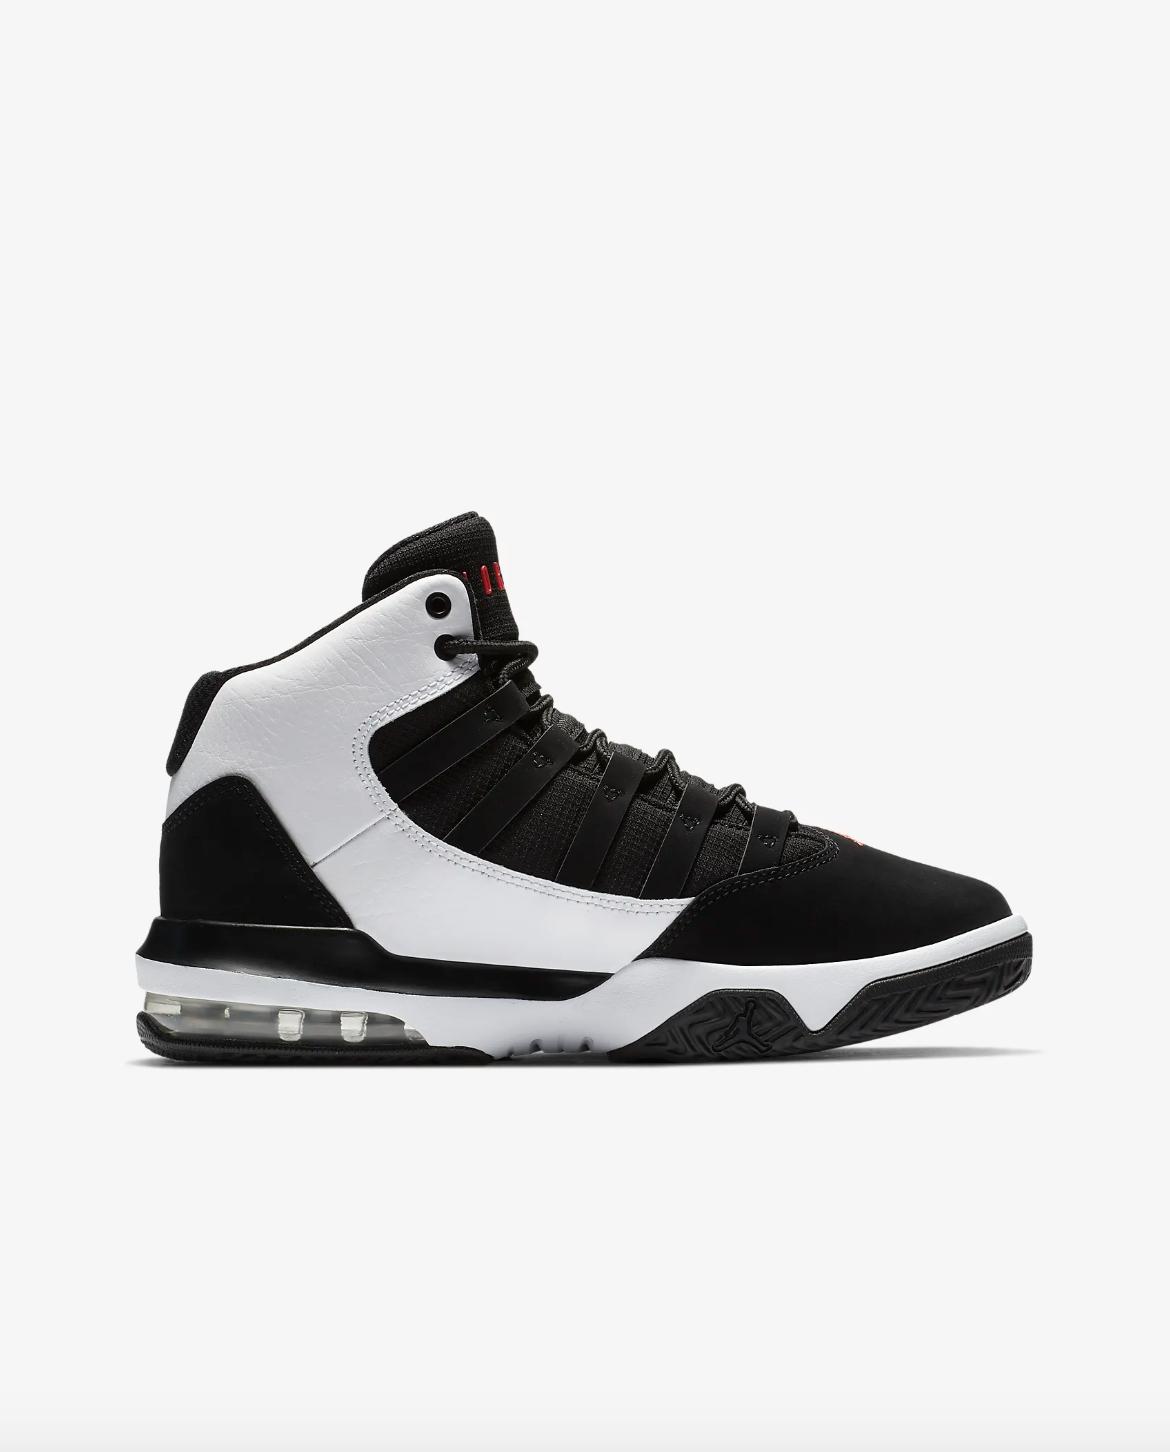 116b2058977b9 Nike Jordan Max Aura GS Scarpe Sportive Ragazzi Bianco   Nero ...